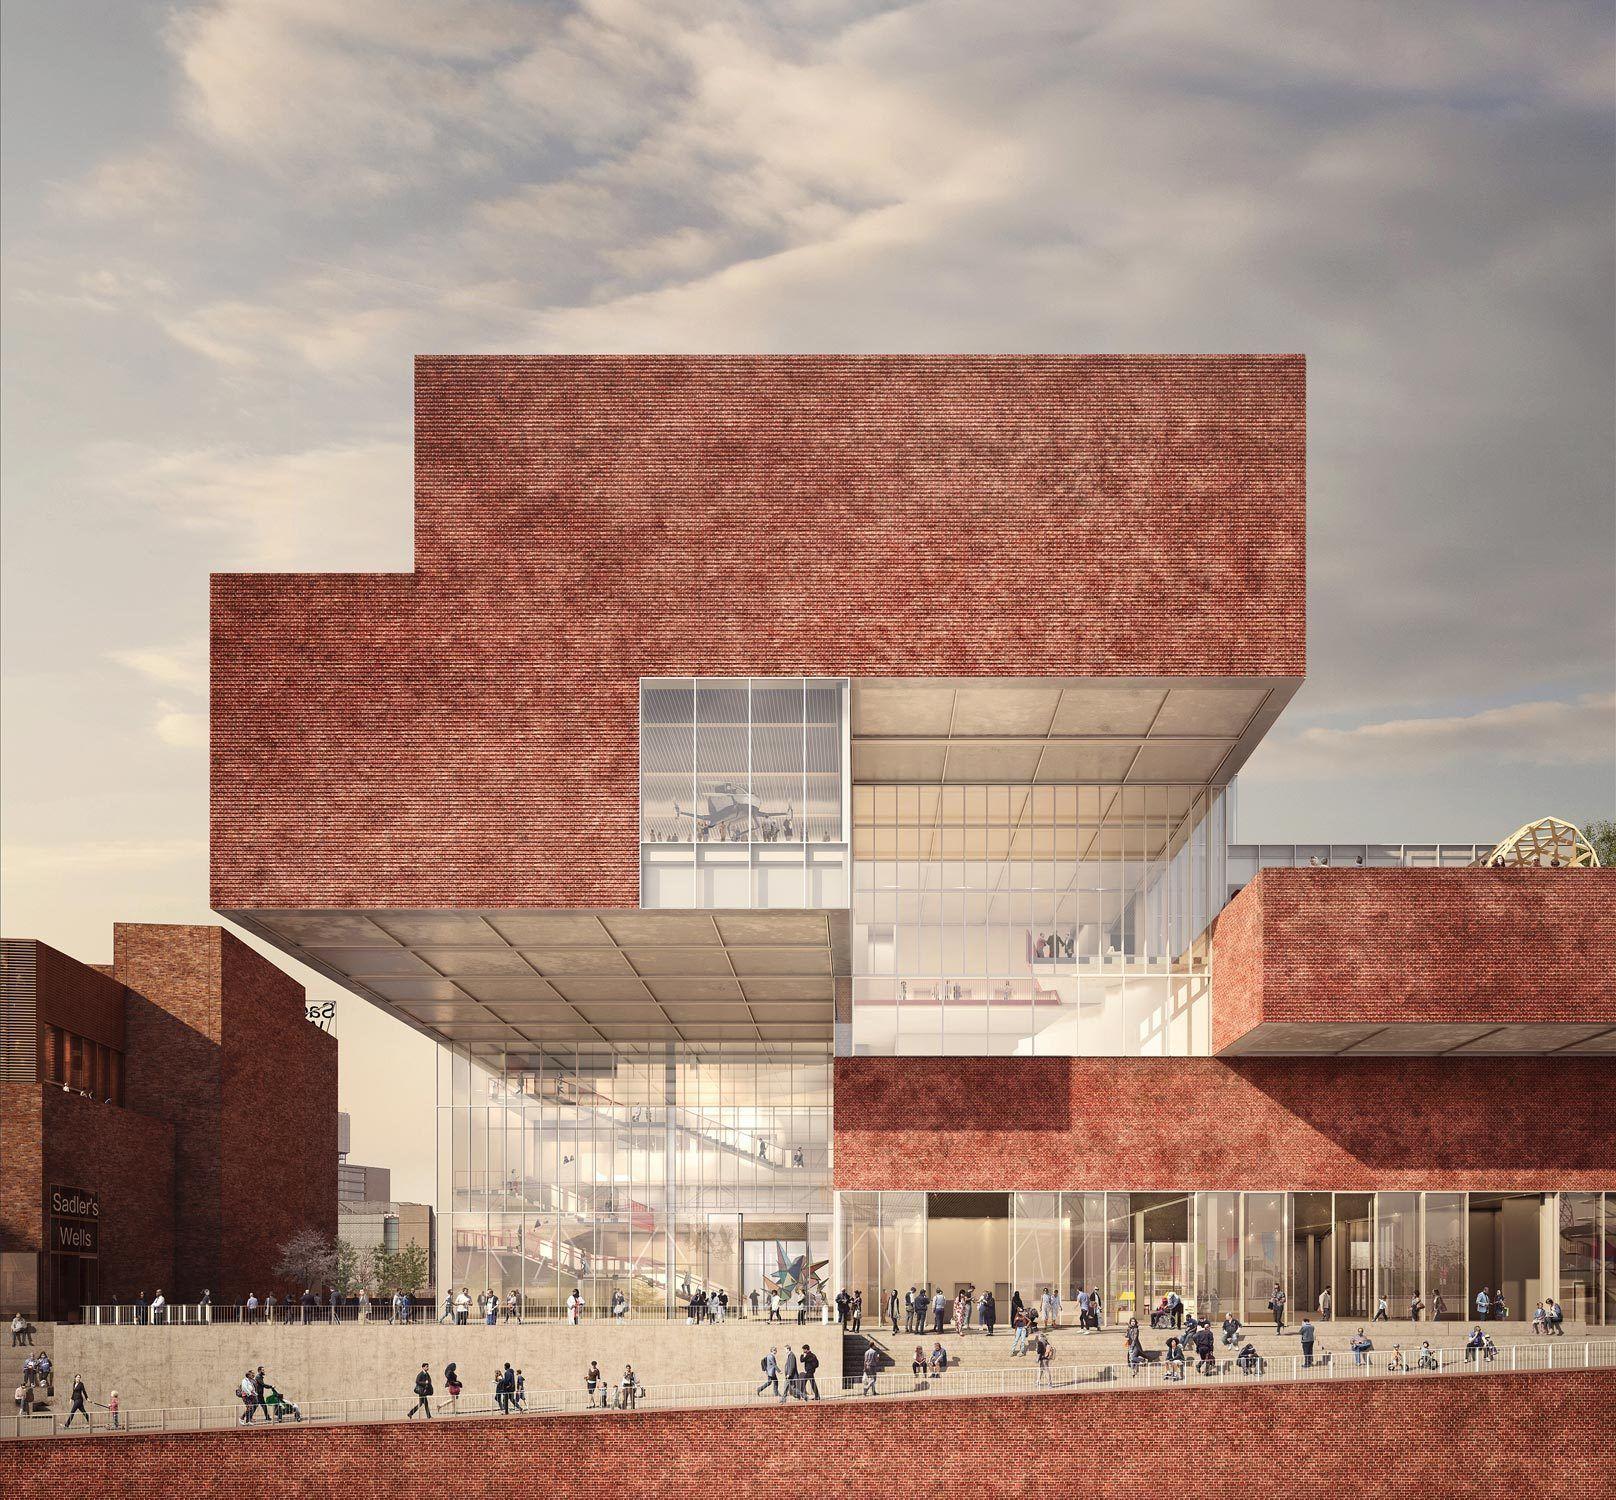 Creative Hub East - Nachnutzung des Olympic Park in London #arquitectonico